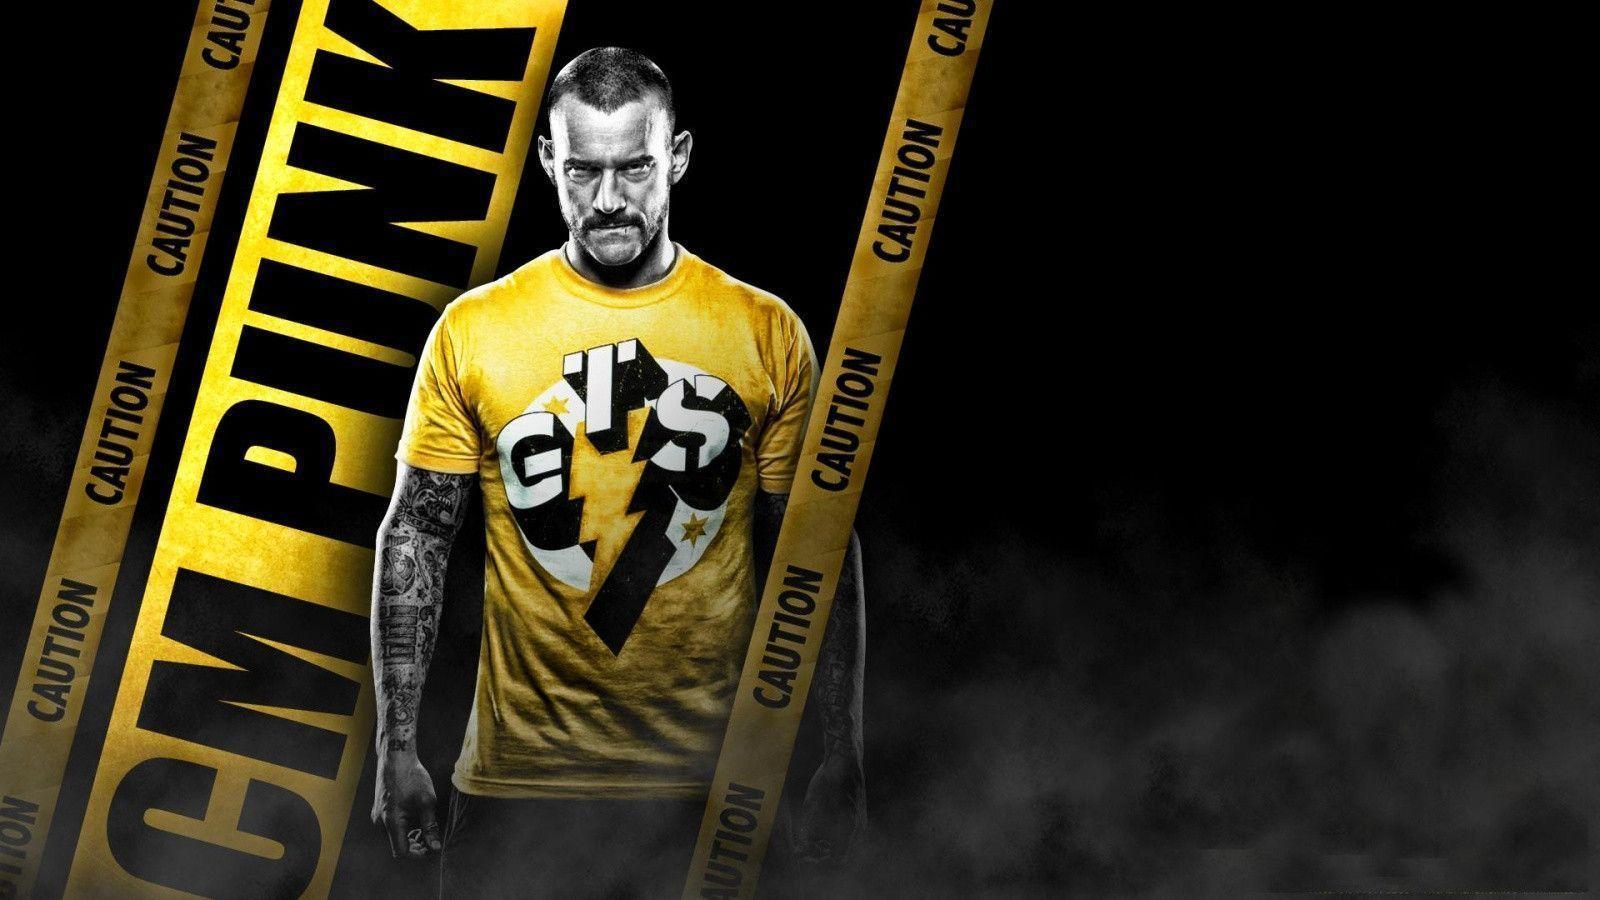 WWE CM Punk Wallpapers 2015 1600x900